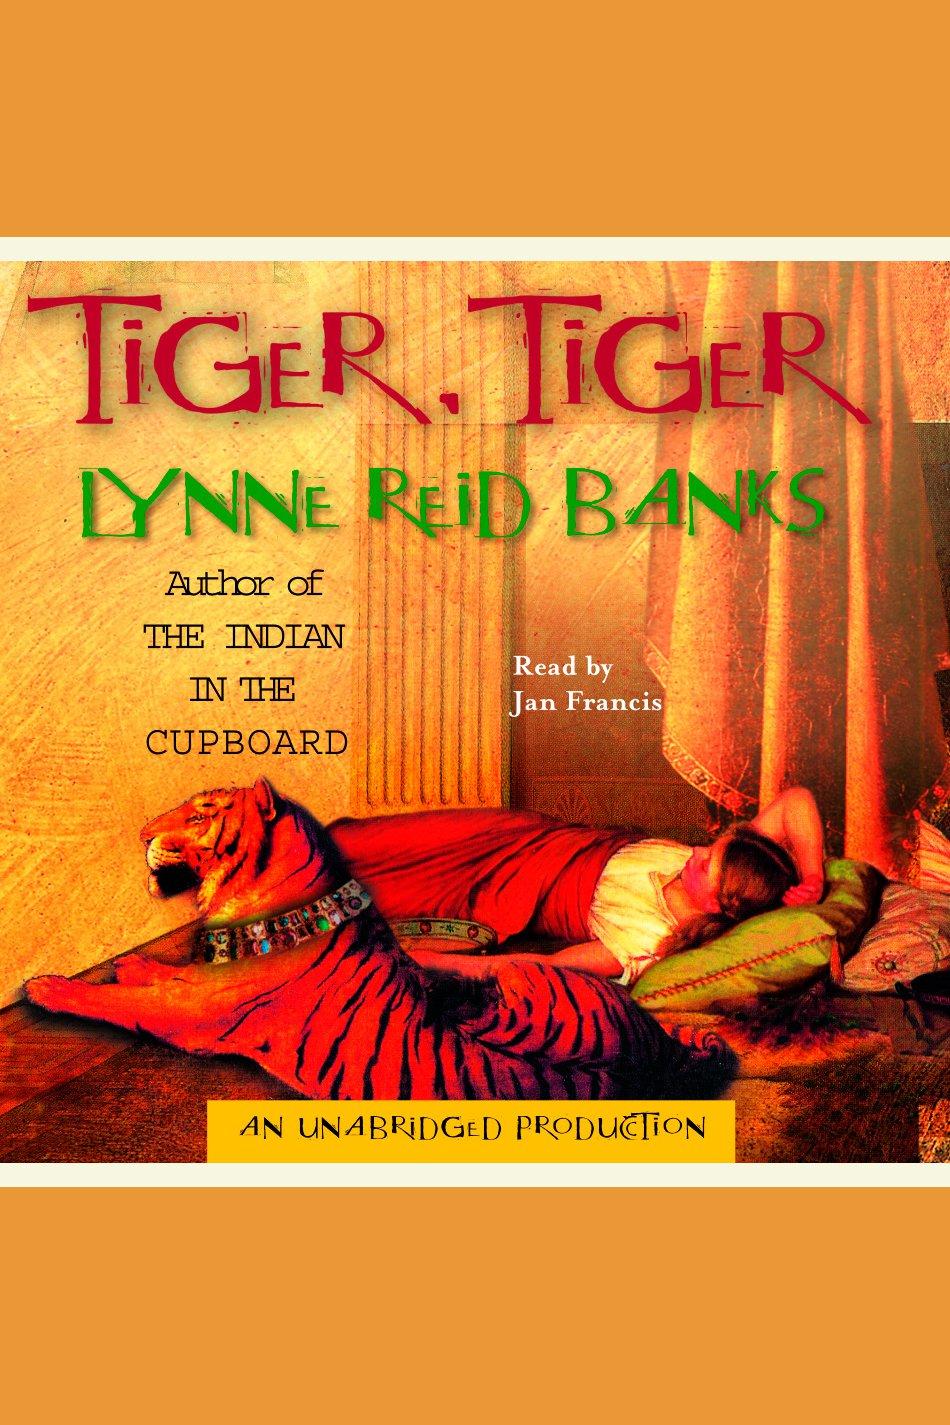 Tiger, tiger cover image